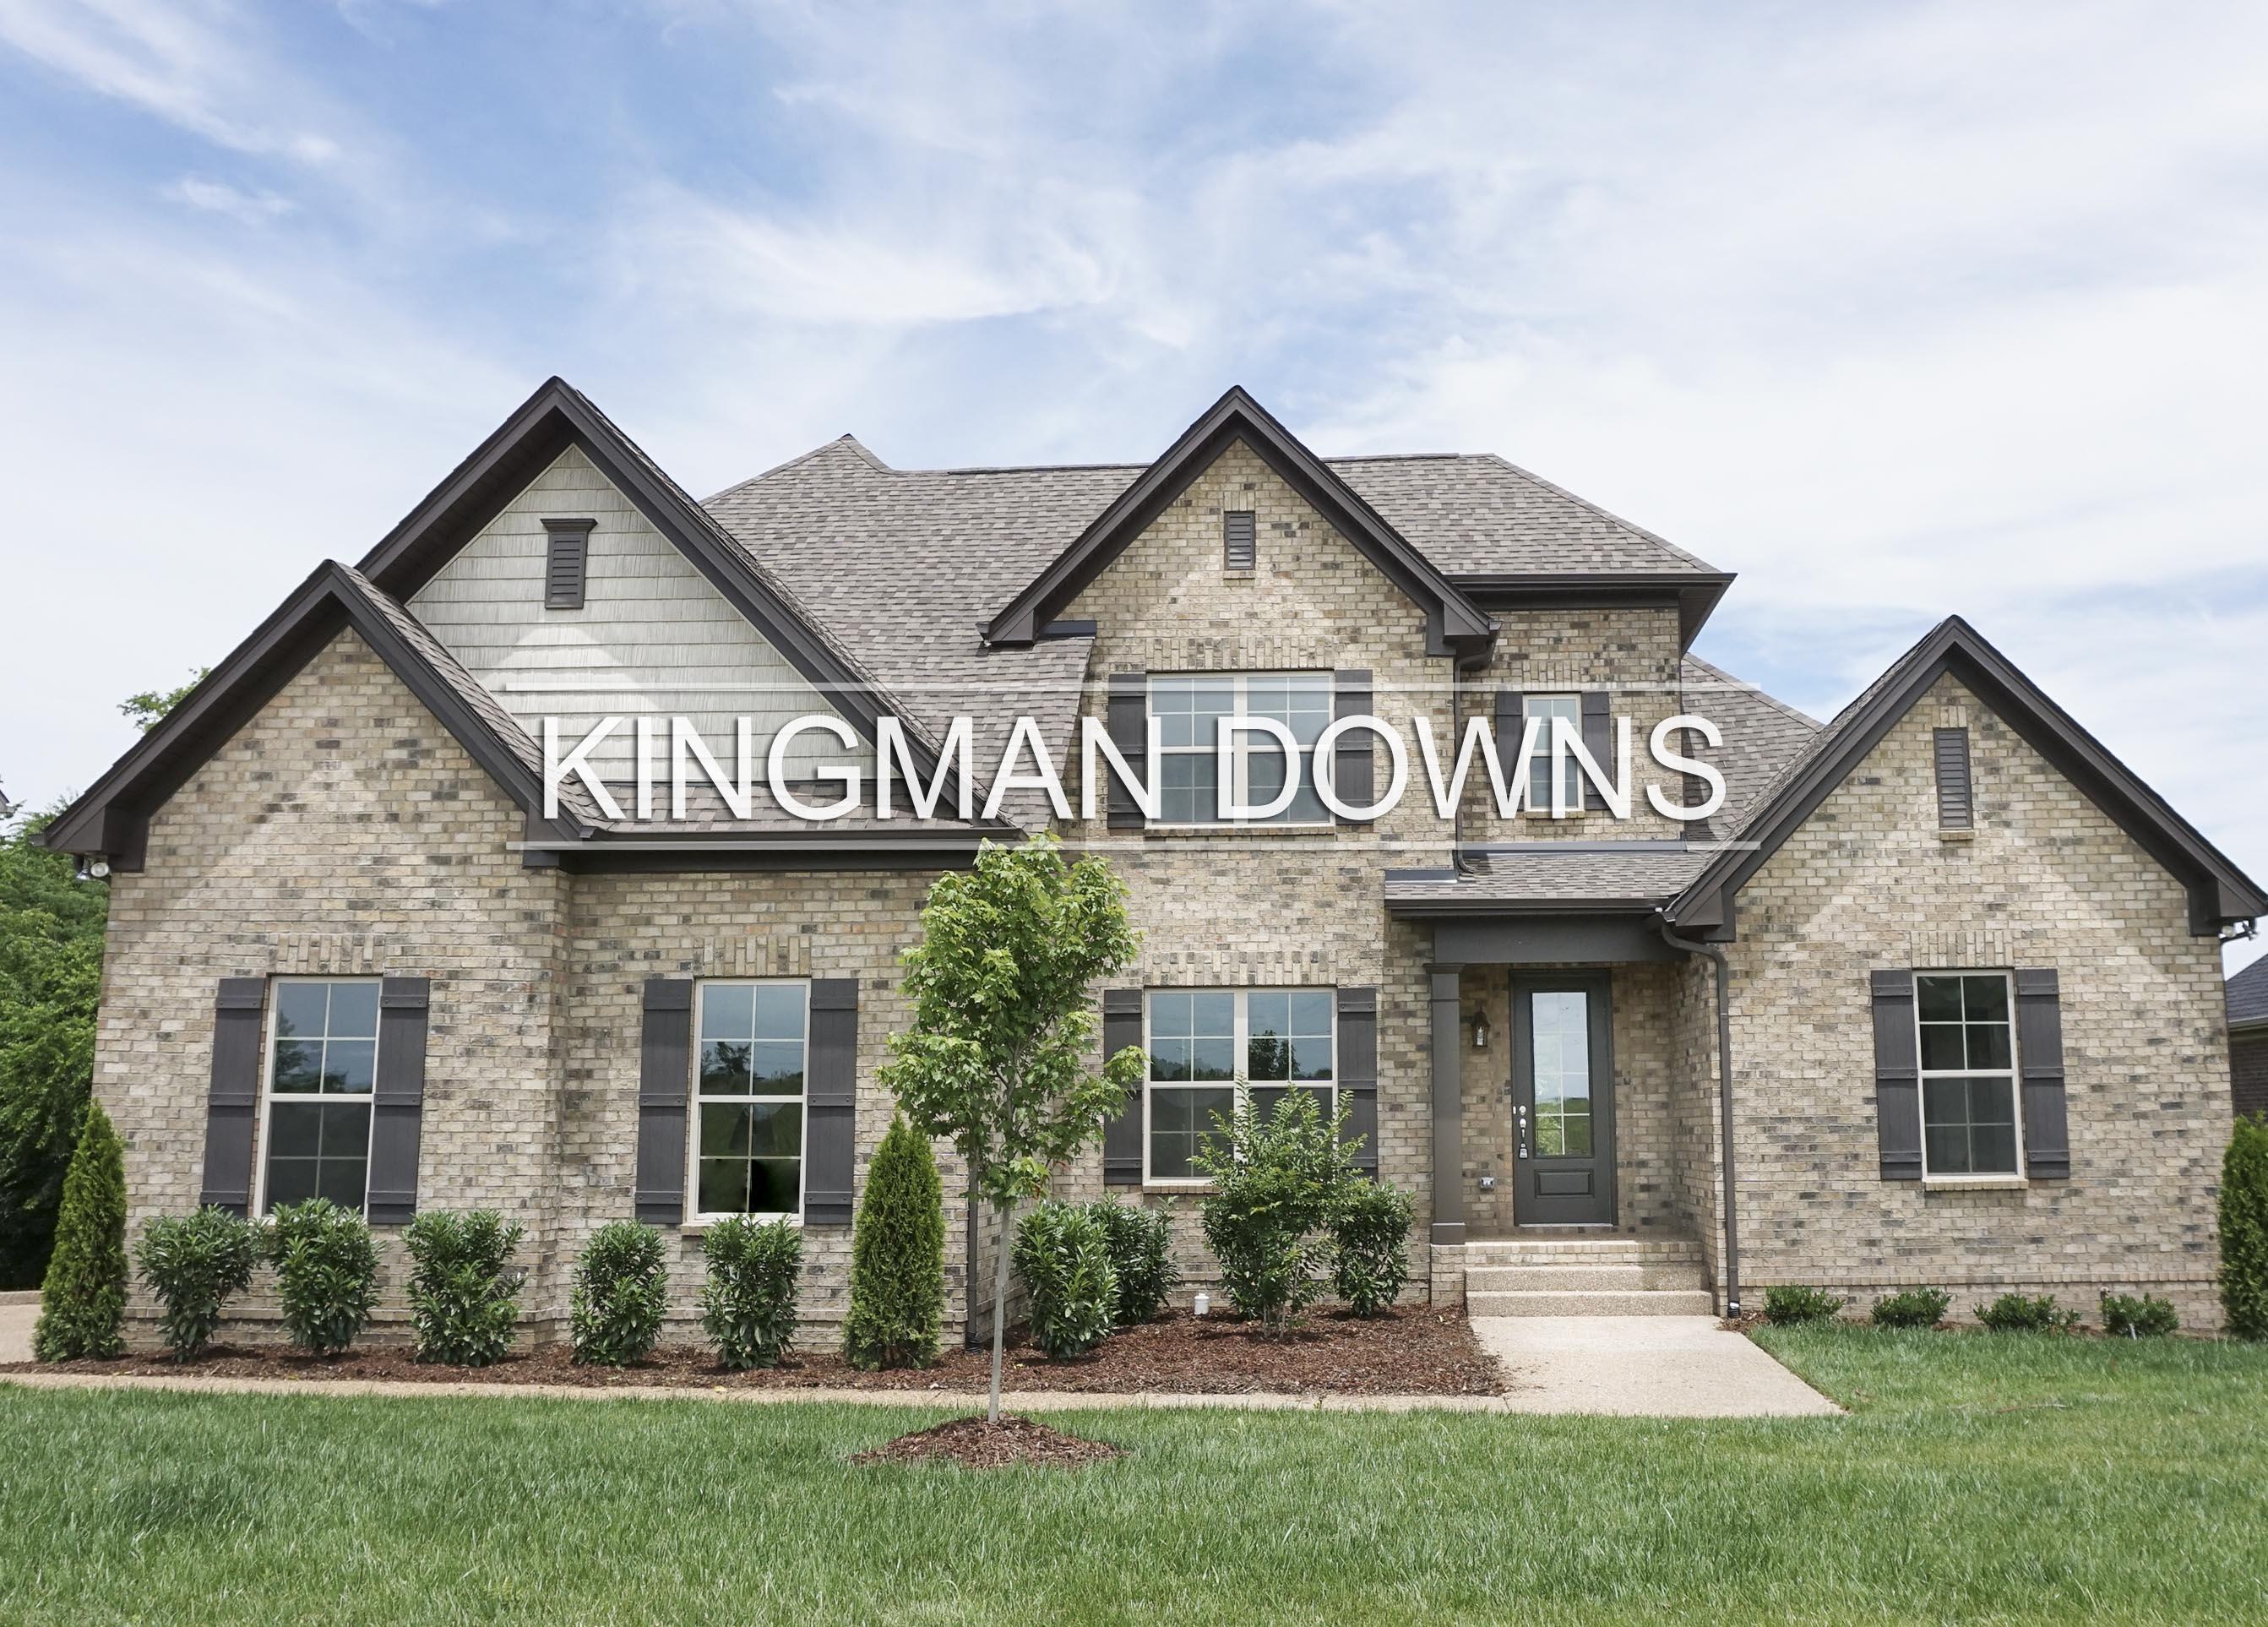 Kingman Downs